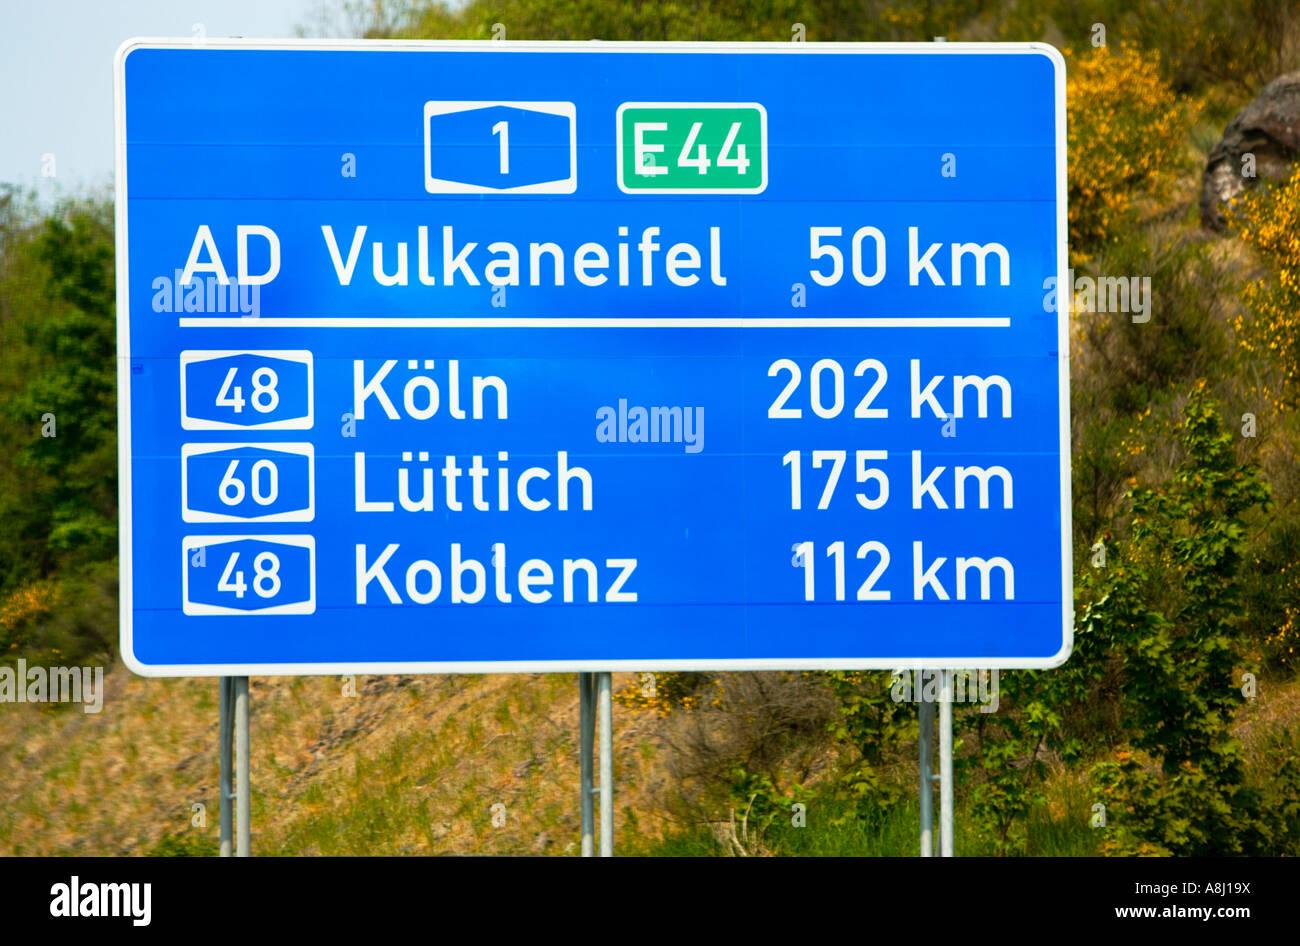 Autoroute allemande distance destination sign, Germany, Europe Photo Stock